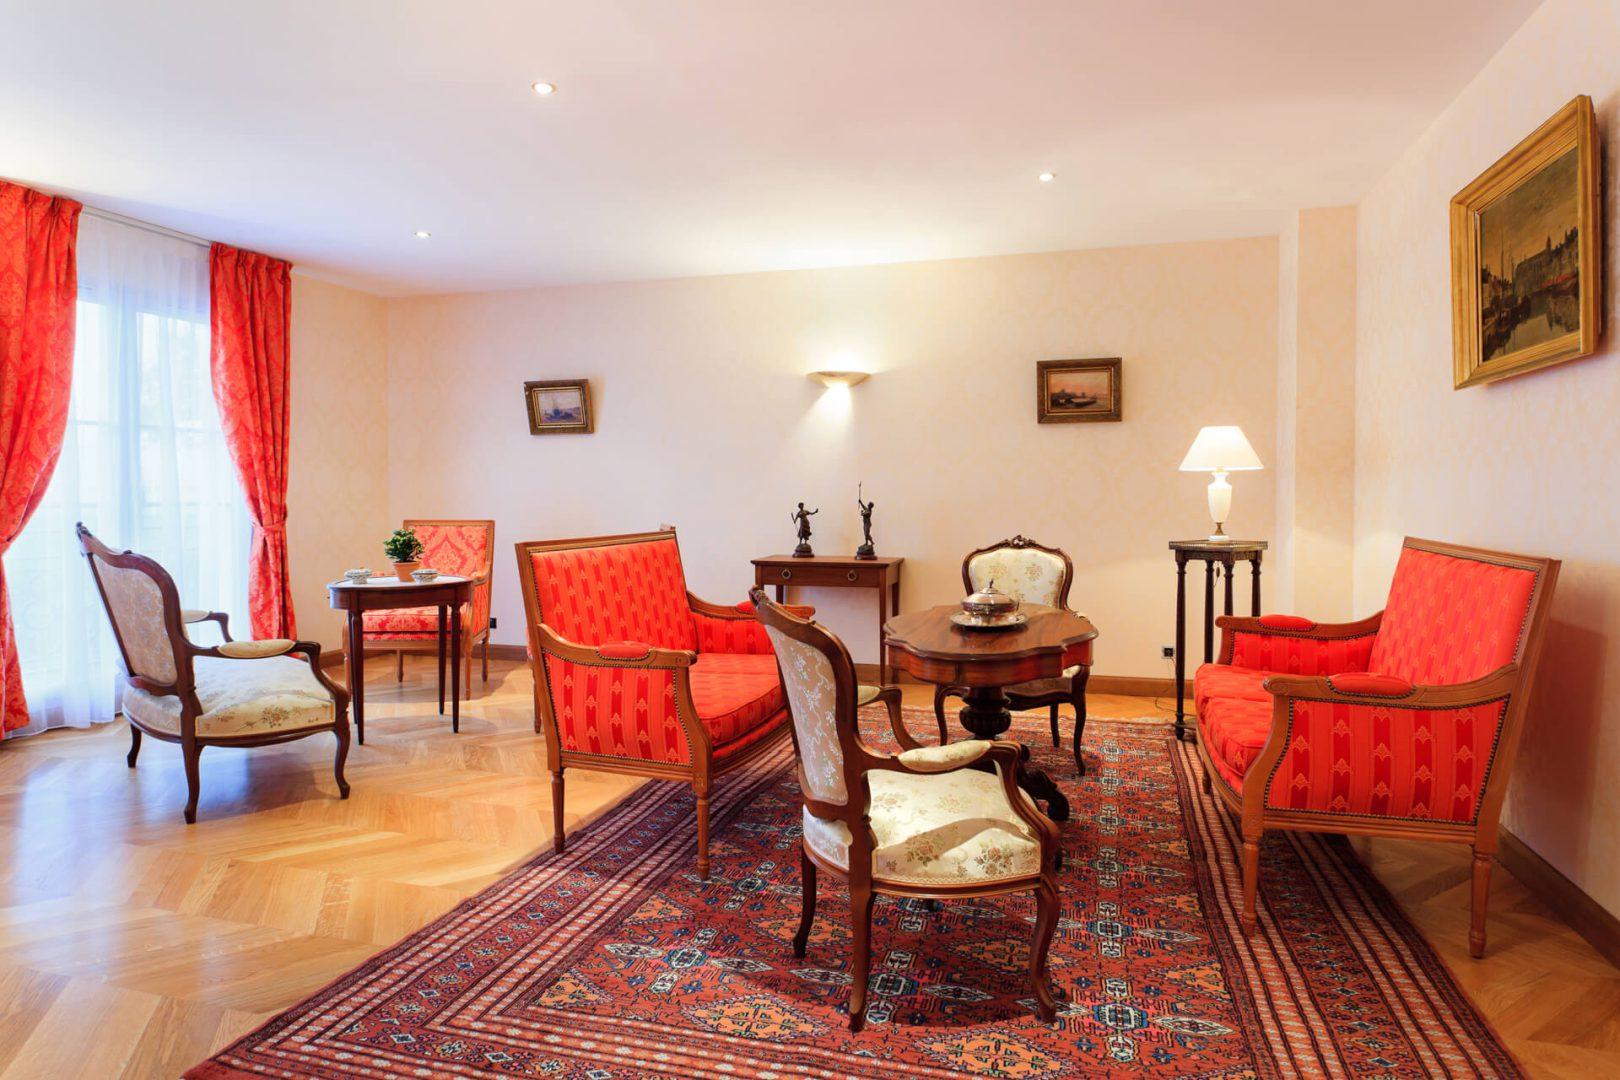 Salon de la résidence senior Trouville, Résidence Villa Medicis Trouville